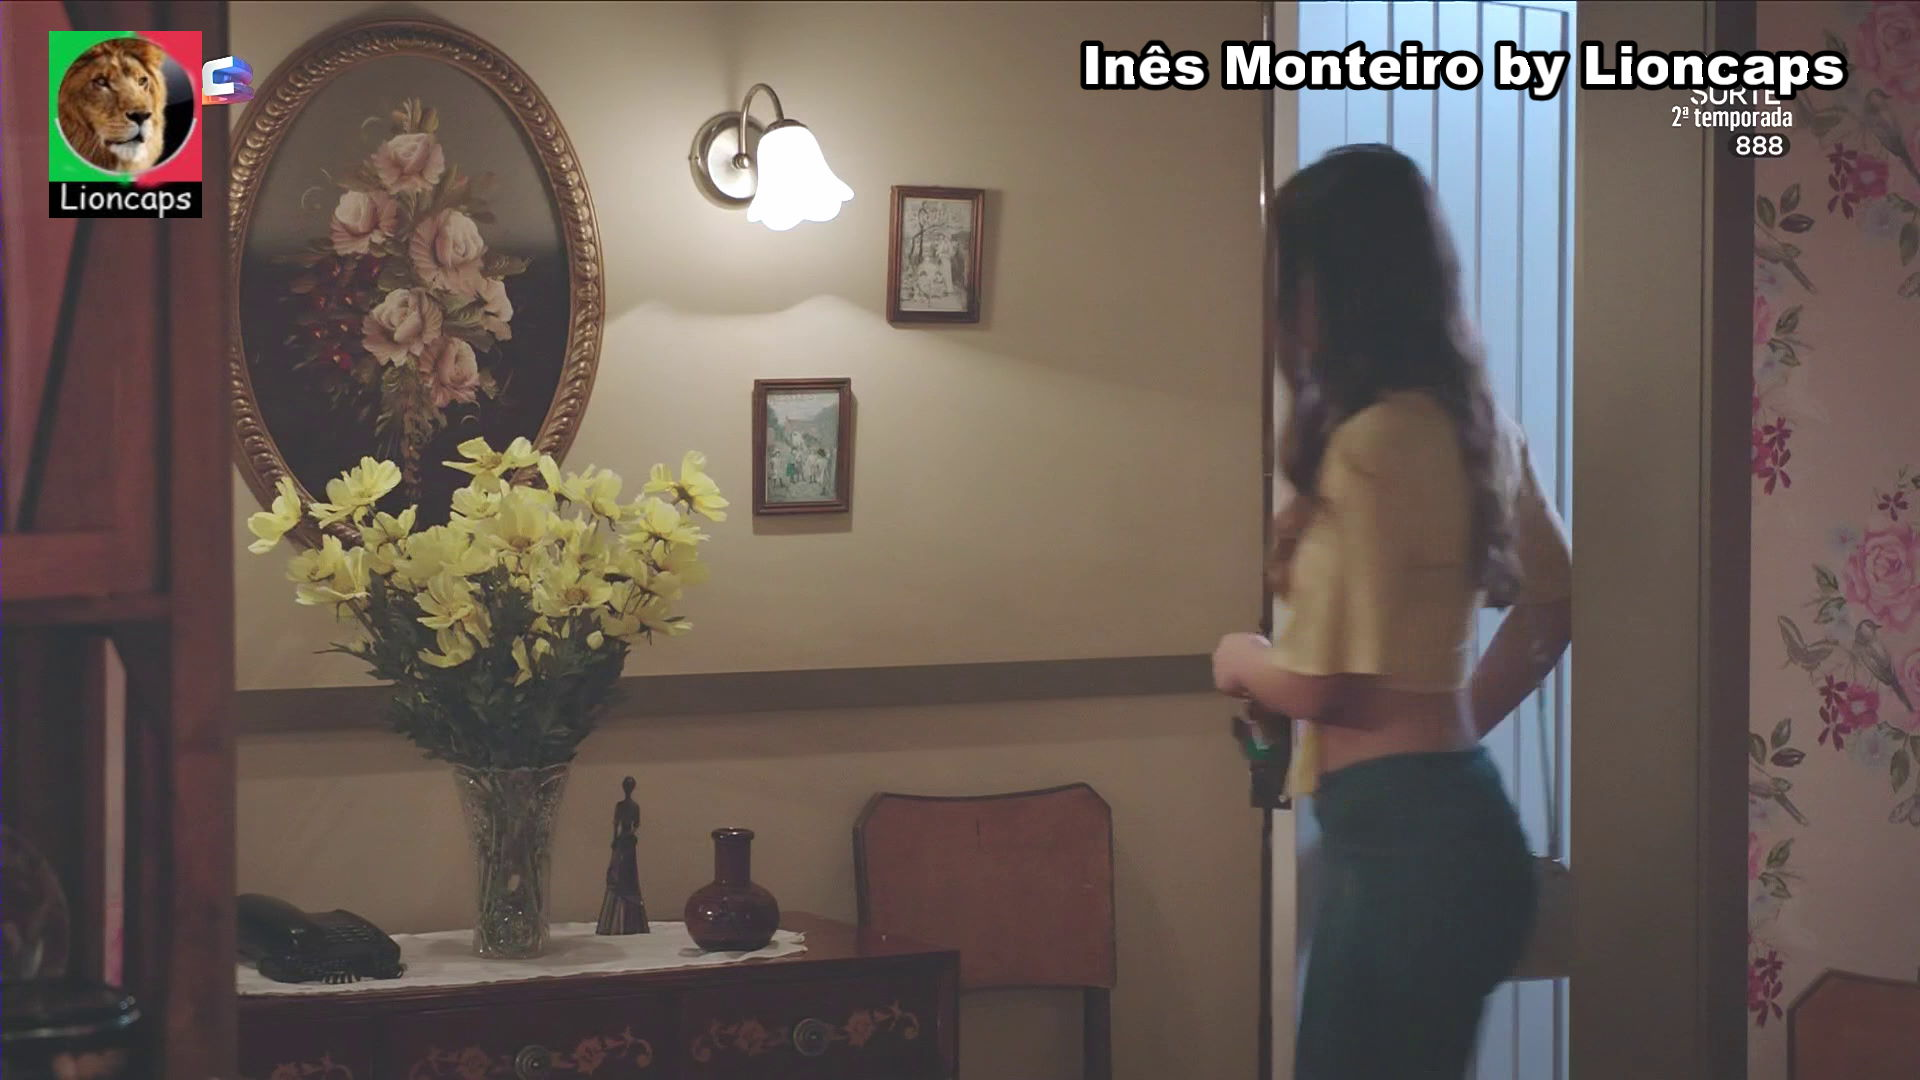 268167654_ines_monteiro_vs190831_1187_122_184lo.JPG